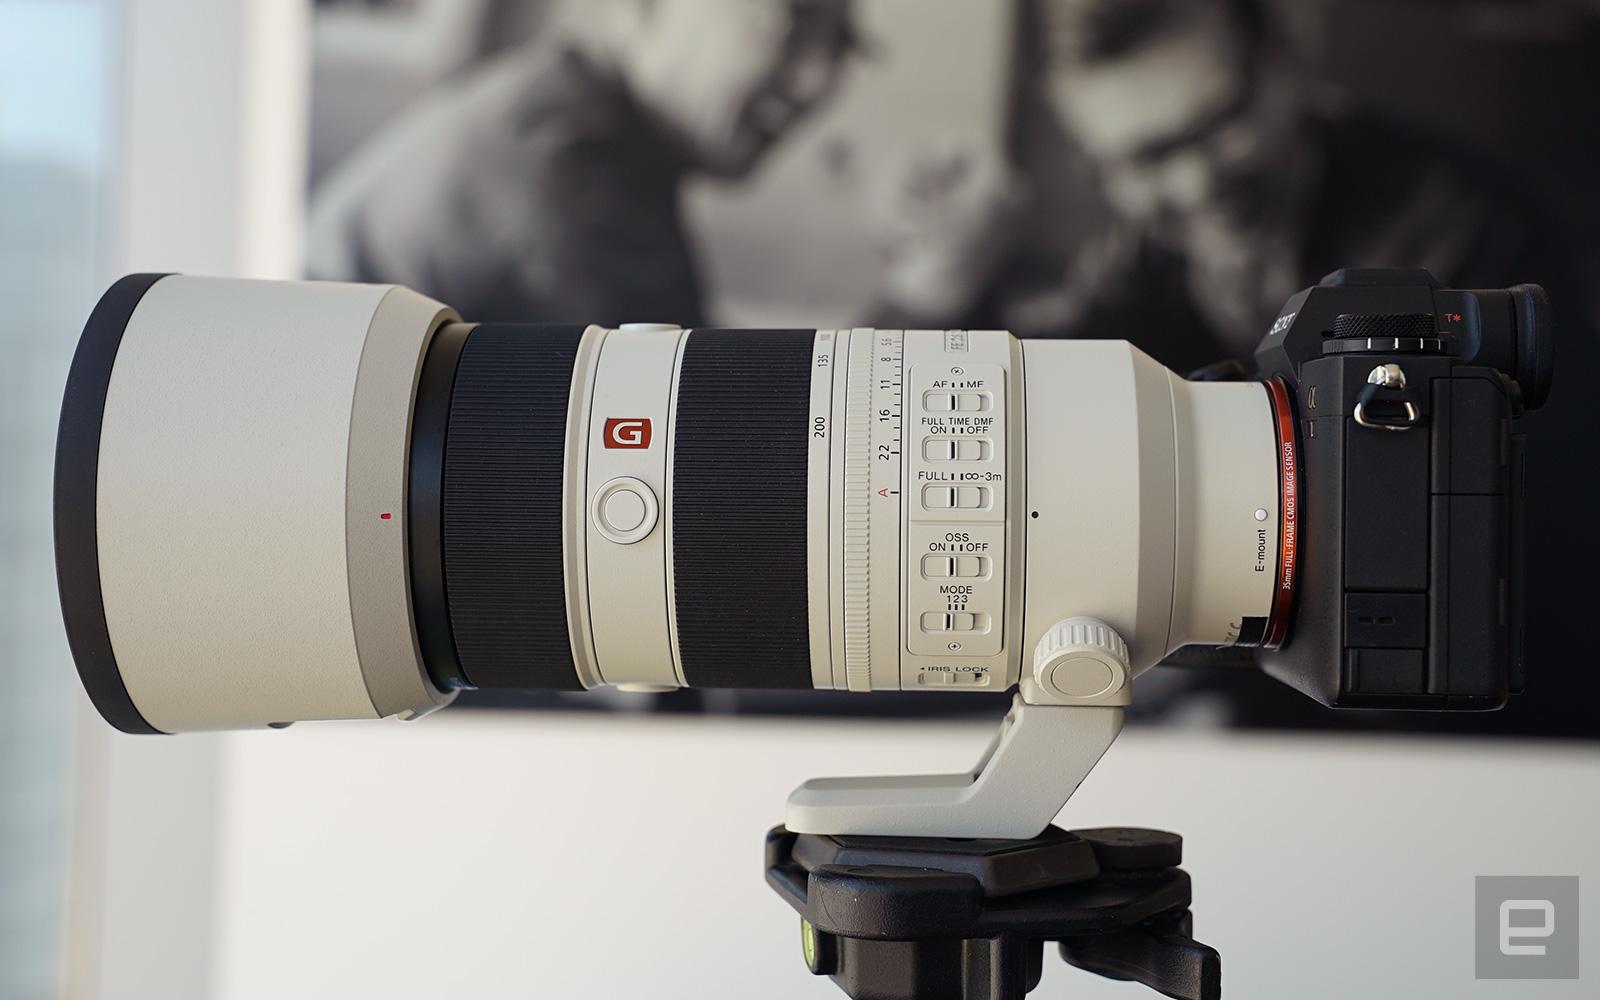 Sony FE 70-200mm F2.8 GM OSS II 動手玩